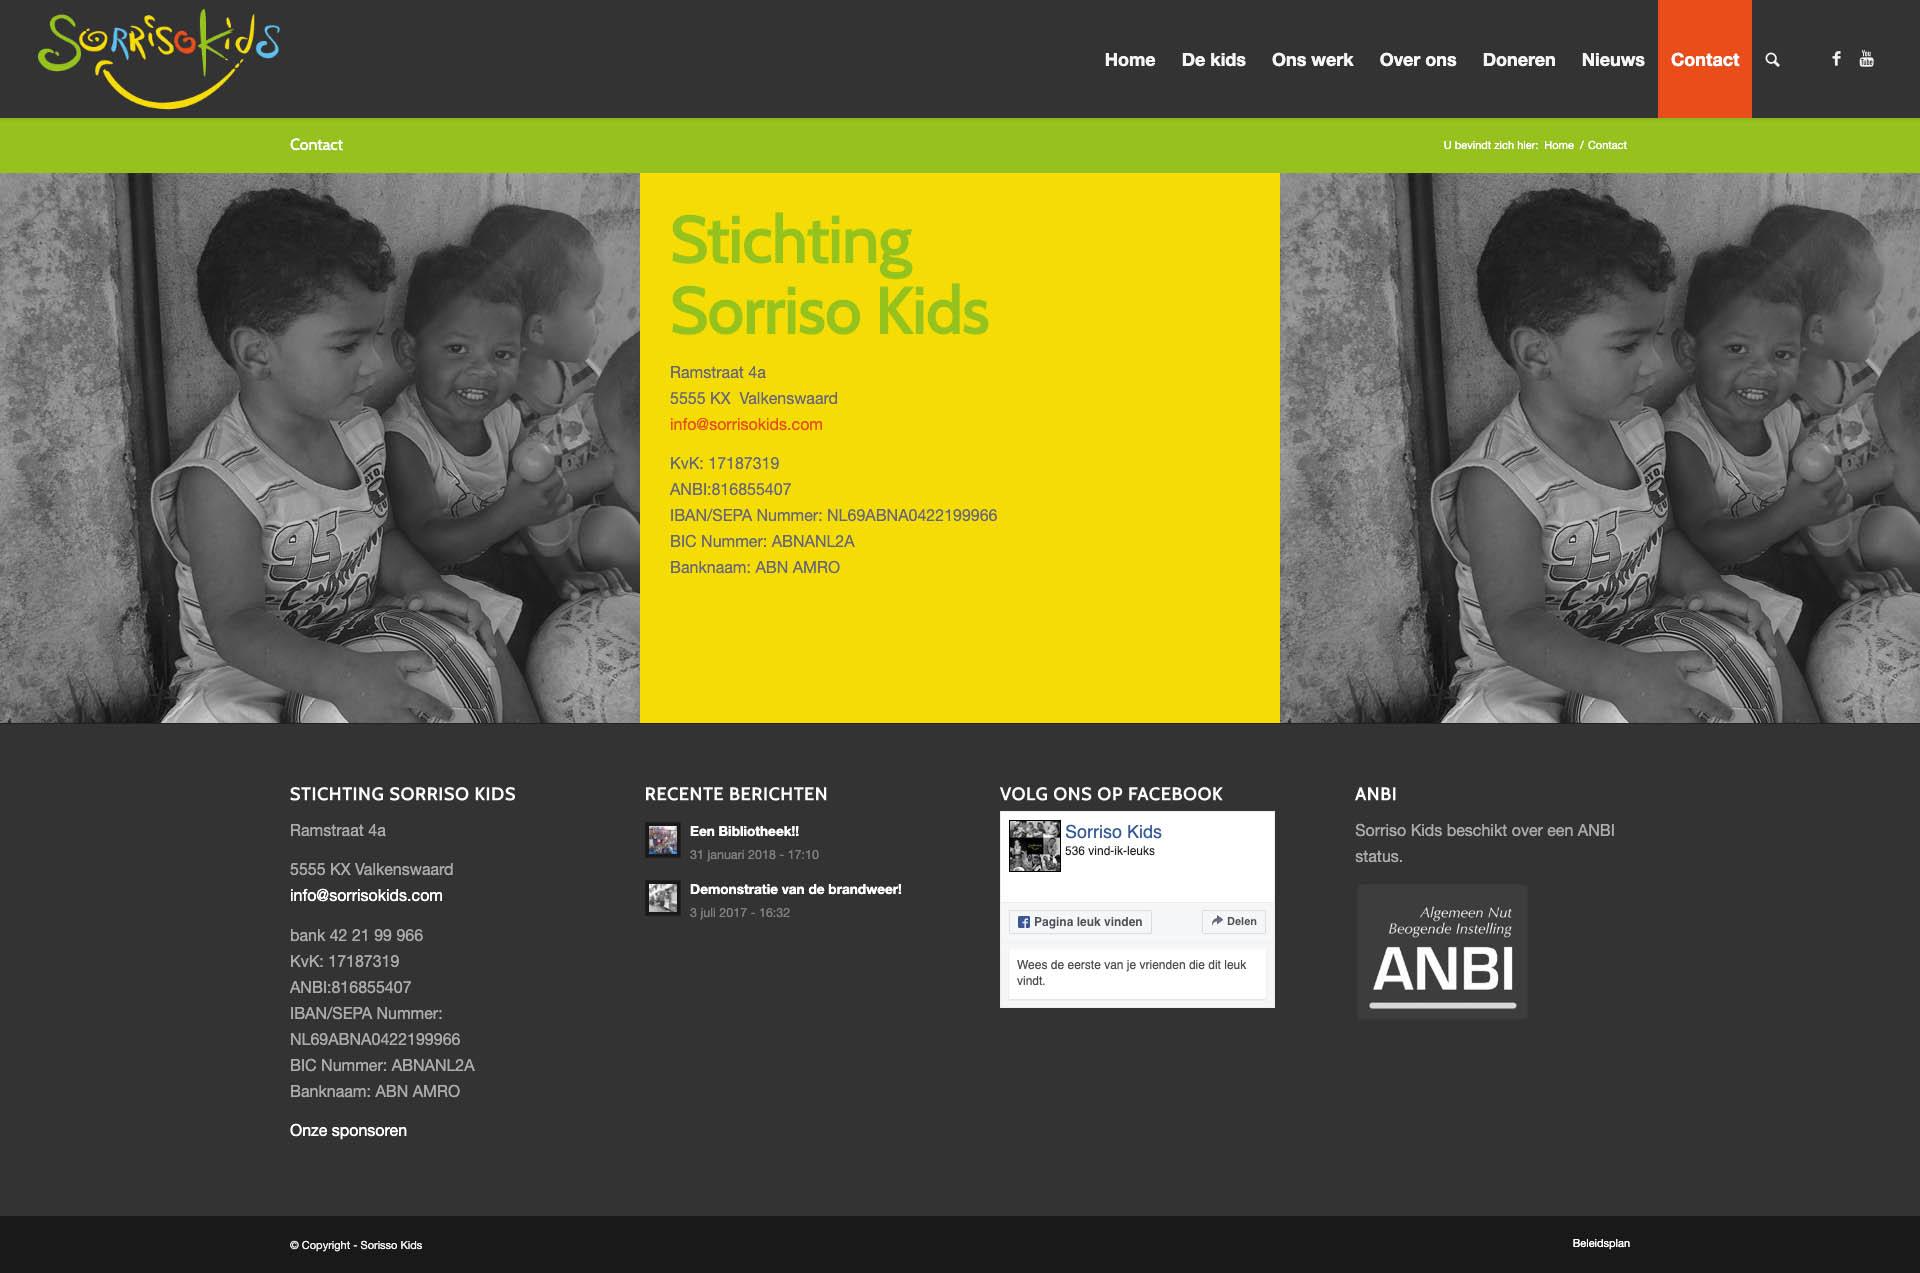 Sorisso Kids - Contact